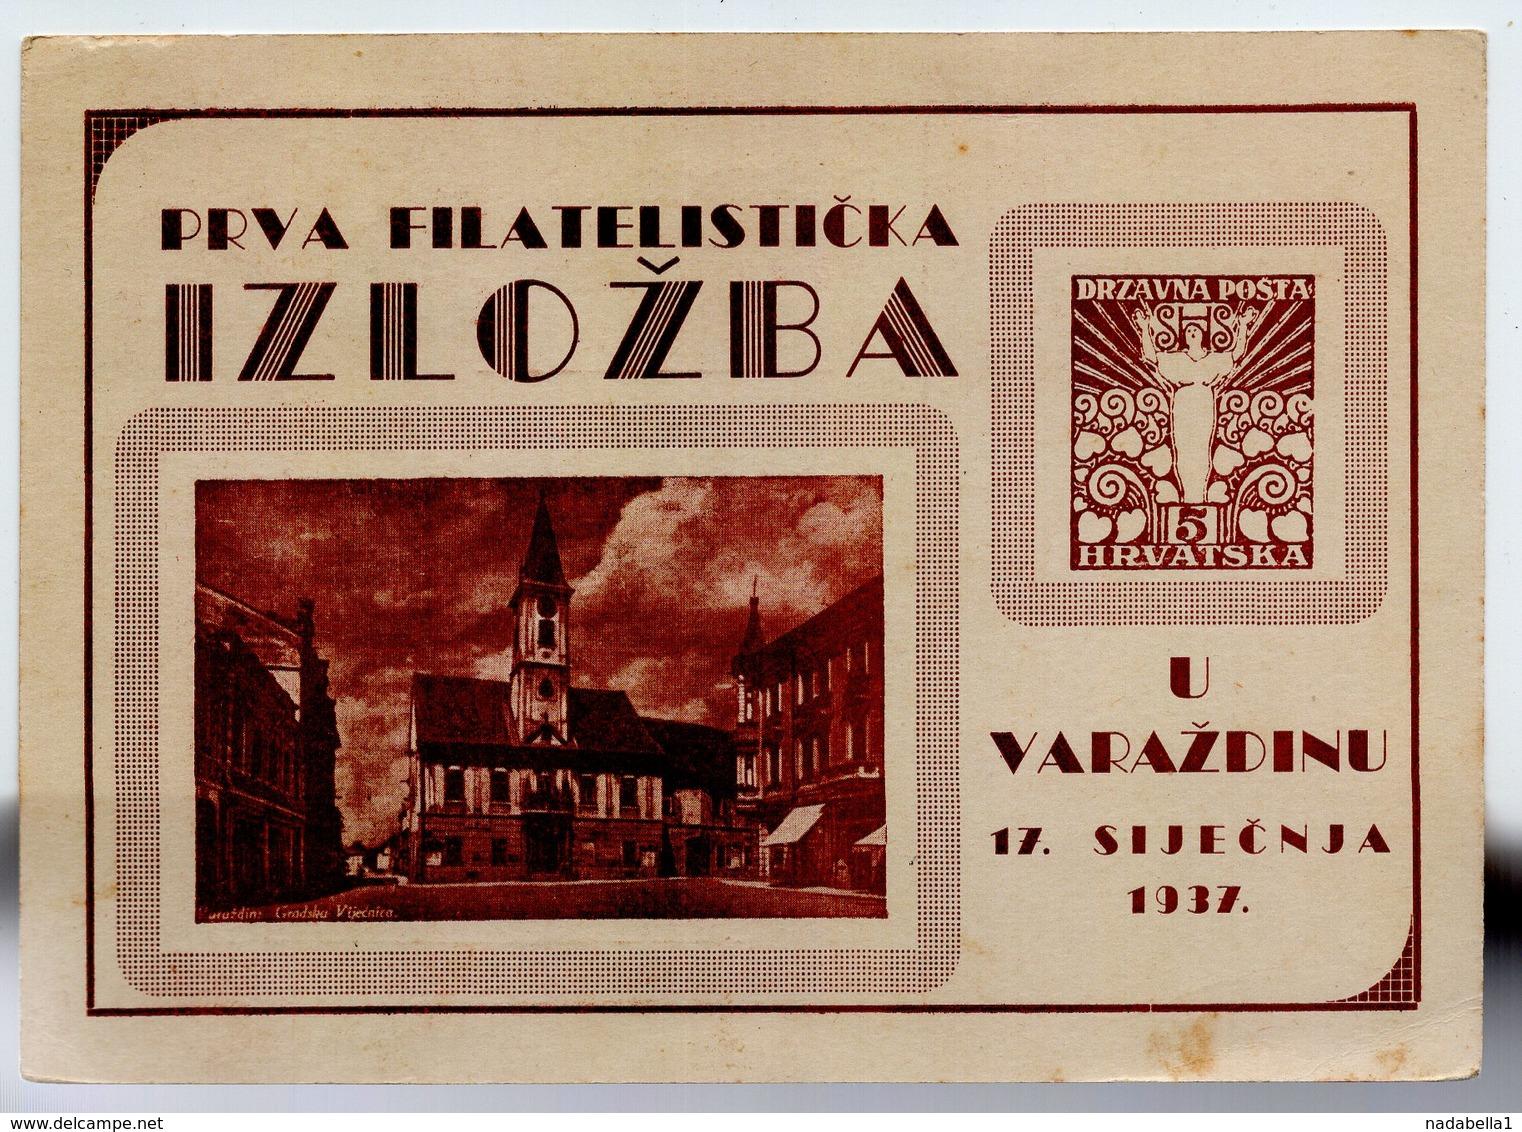 1937 YUGOSLAVIA, CROATIA, SPECIAL CARD AND SPECIAL CANCELATION IN RED - 1931-1941 Kingdom Of Yugoslavia